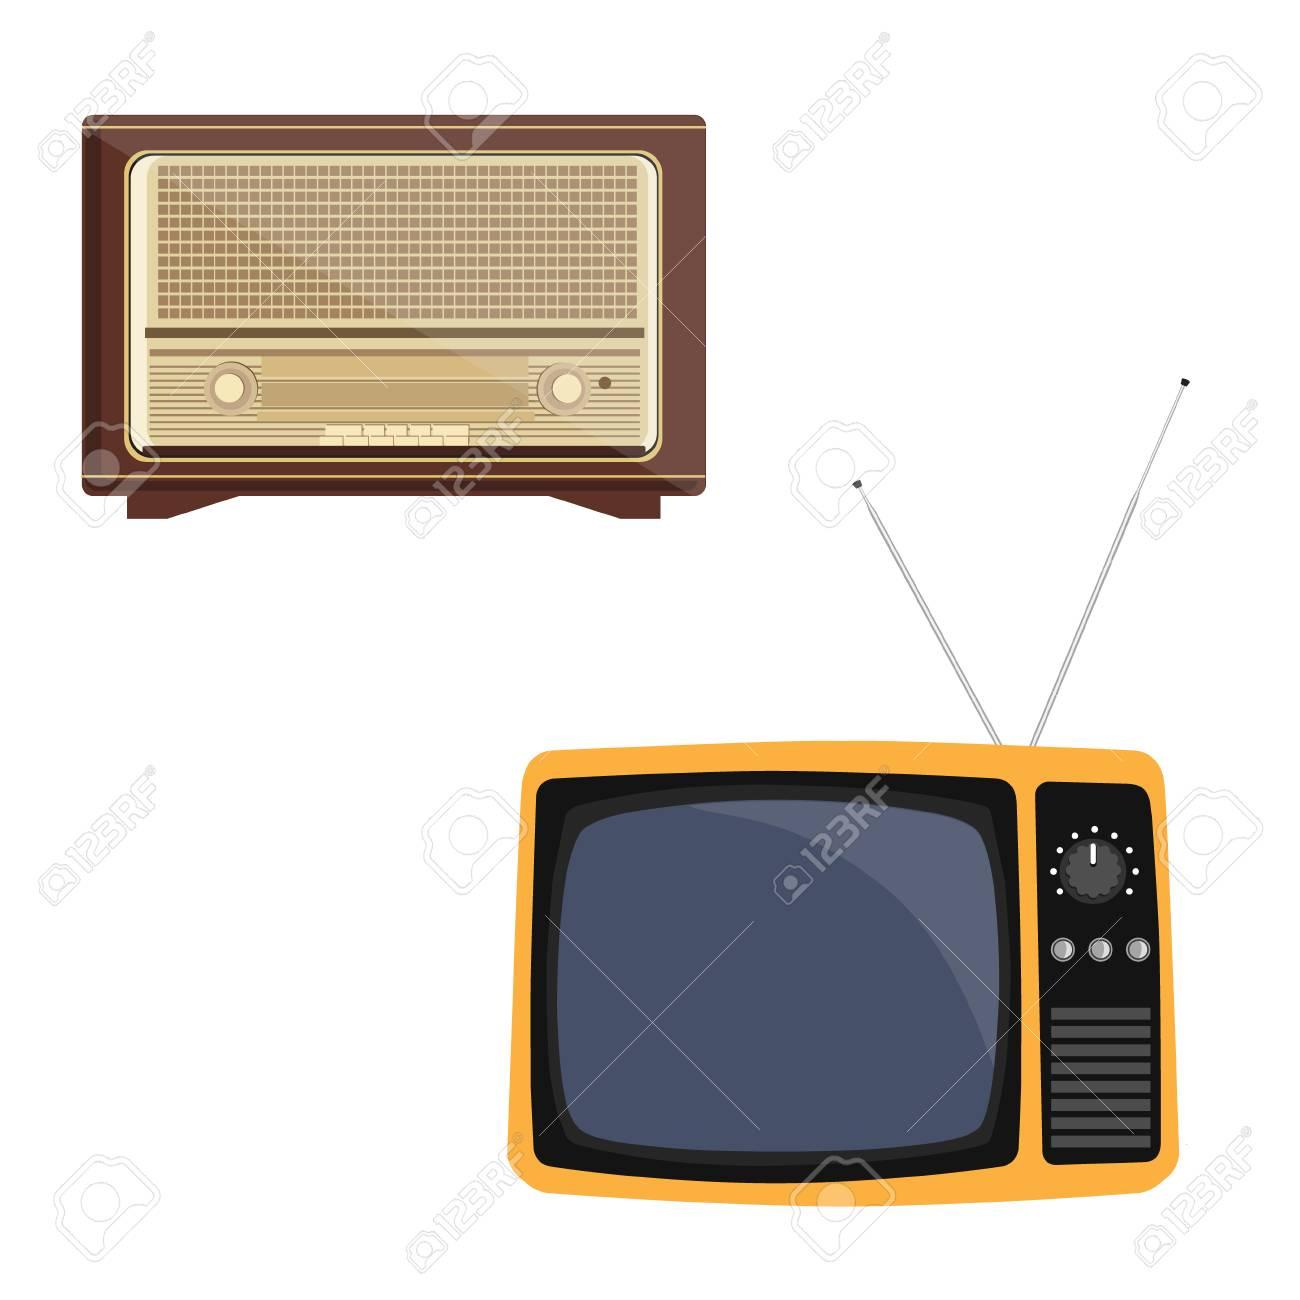 illustration raster illustration orange retro tv with antenna flat icon retro television old radio receiver of the last century